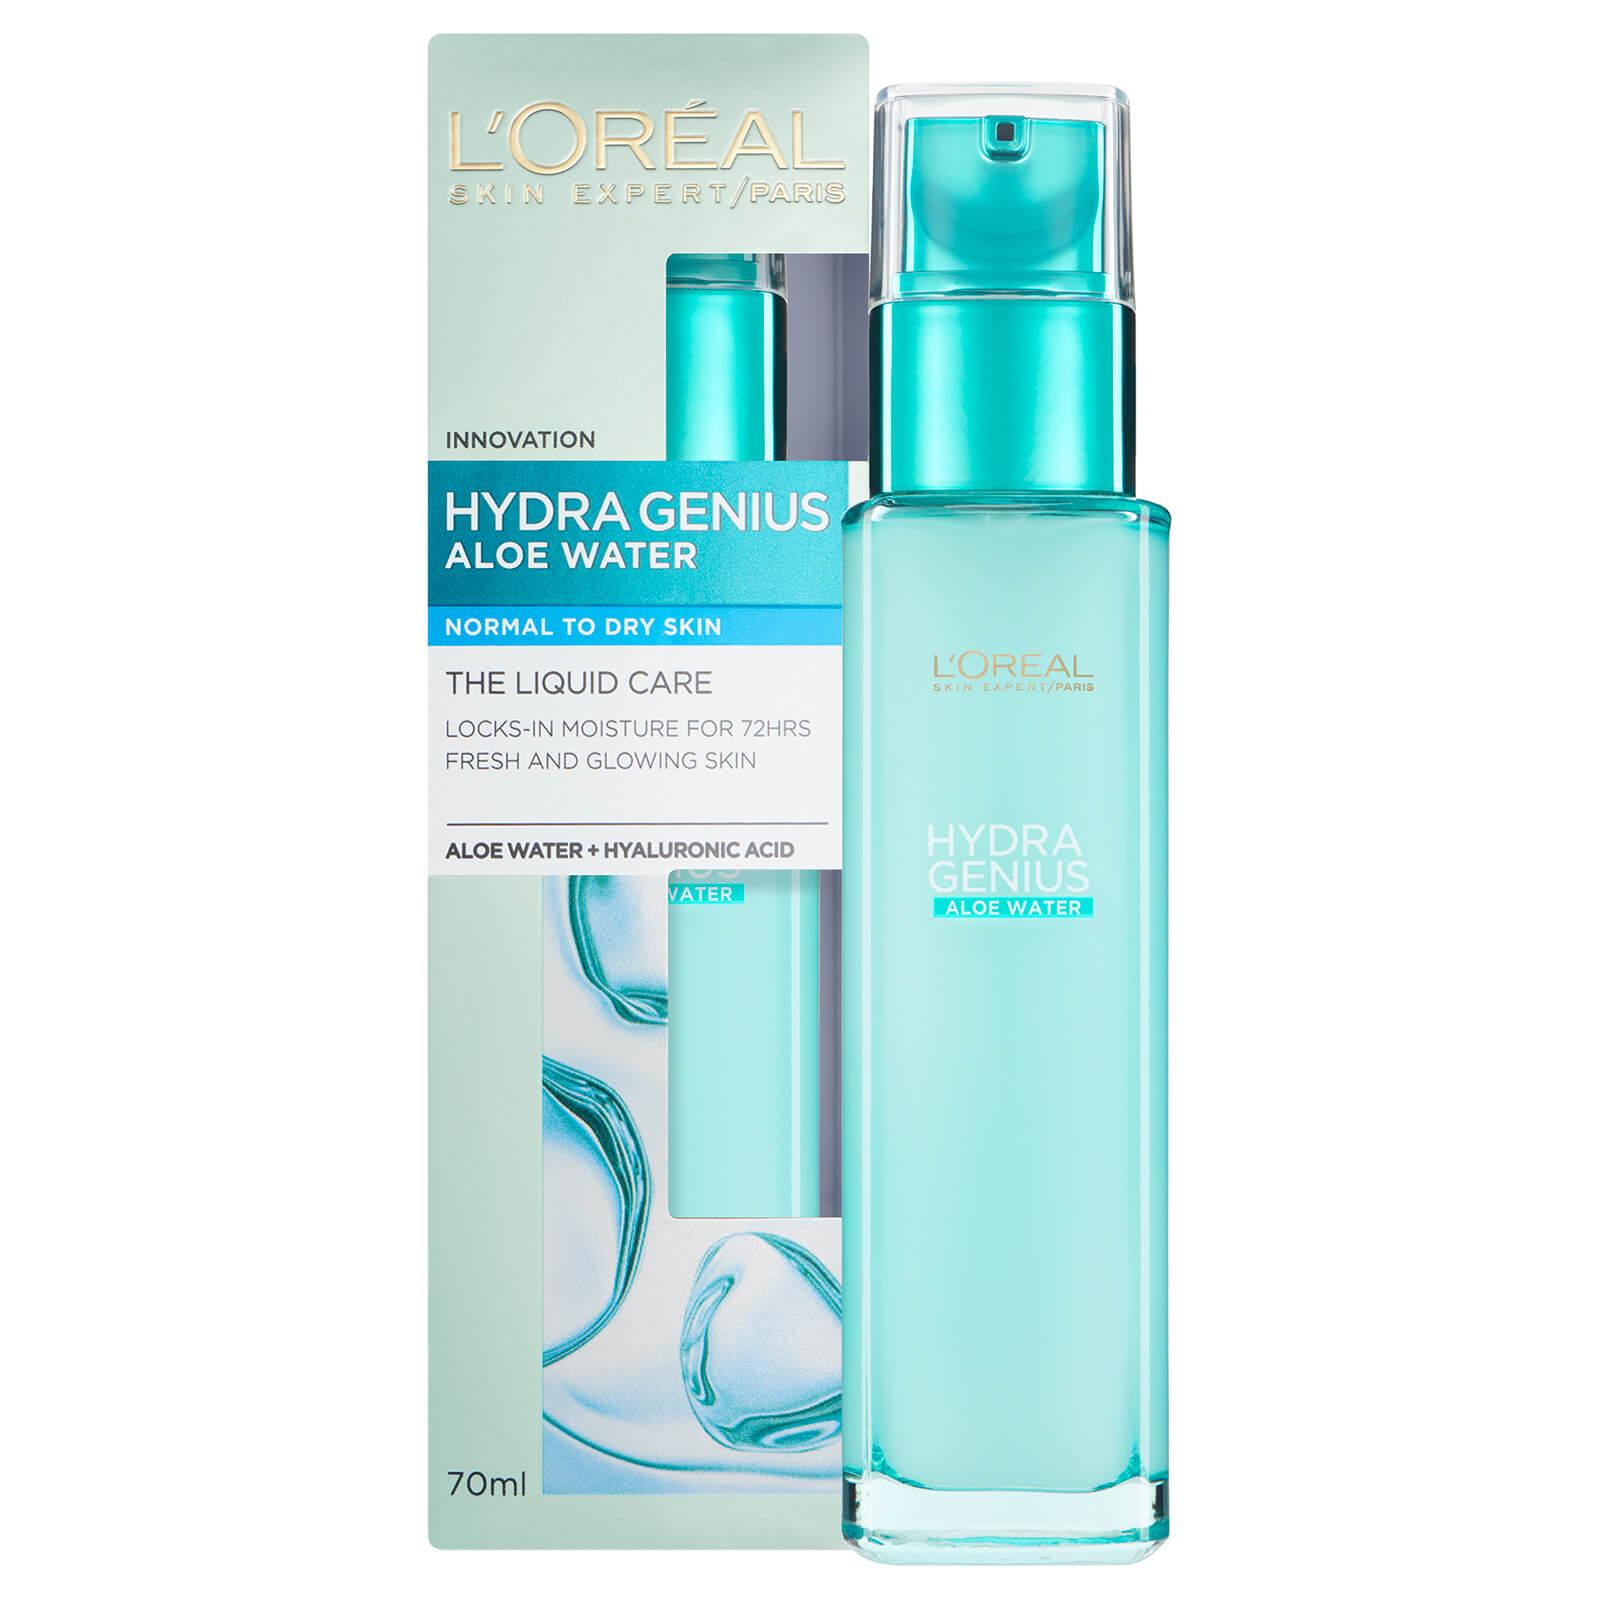 L'Oréal - L'Oréal Paris Hydra Genius Liquid Care Moisturiser Normal Dry Skin 70ml